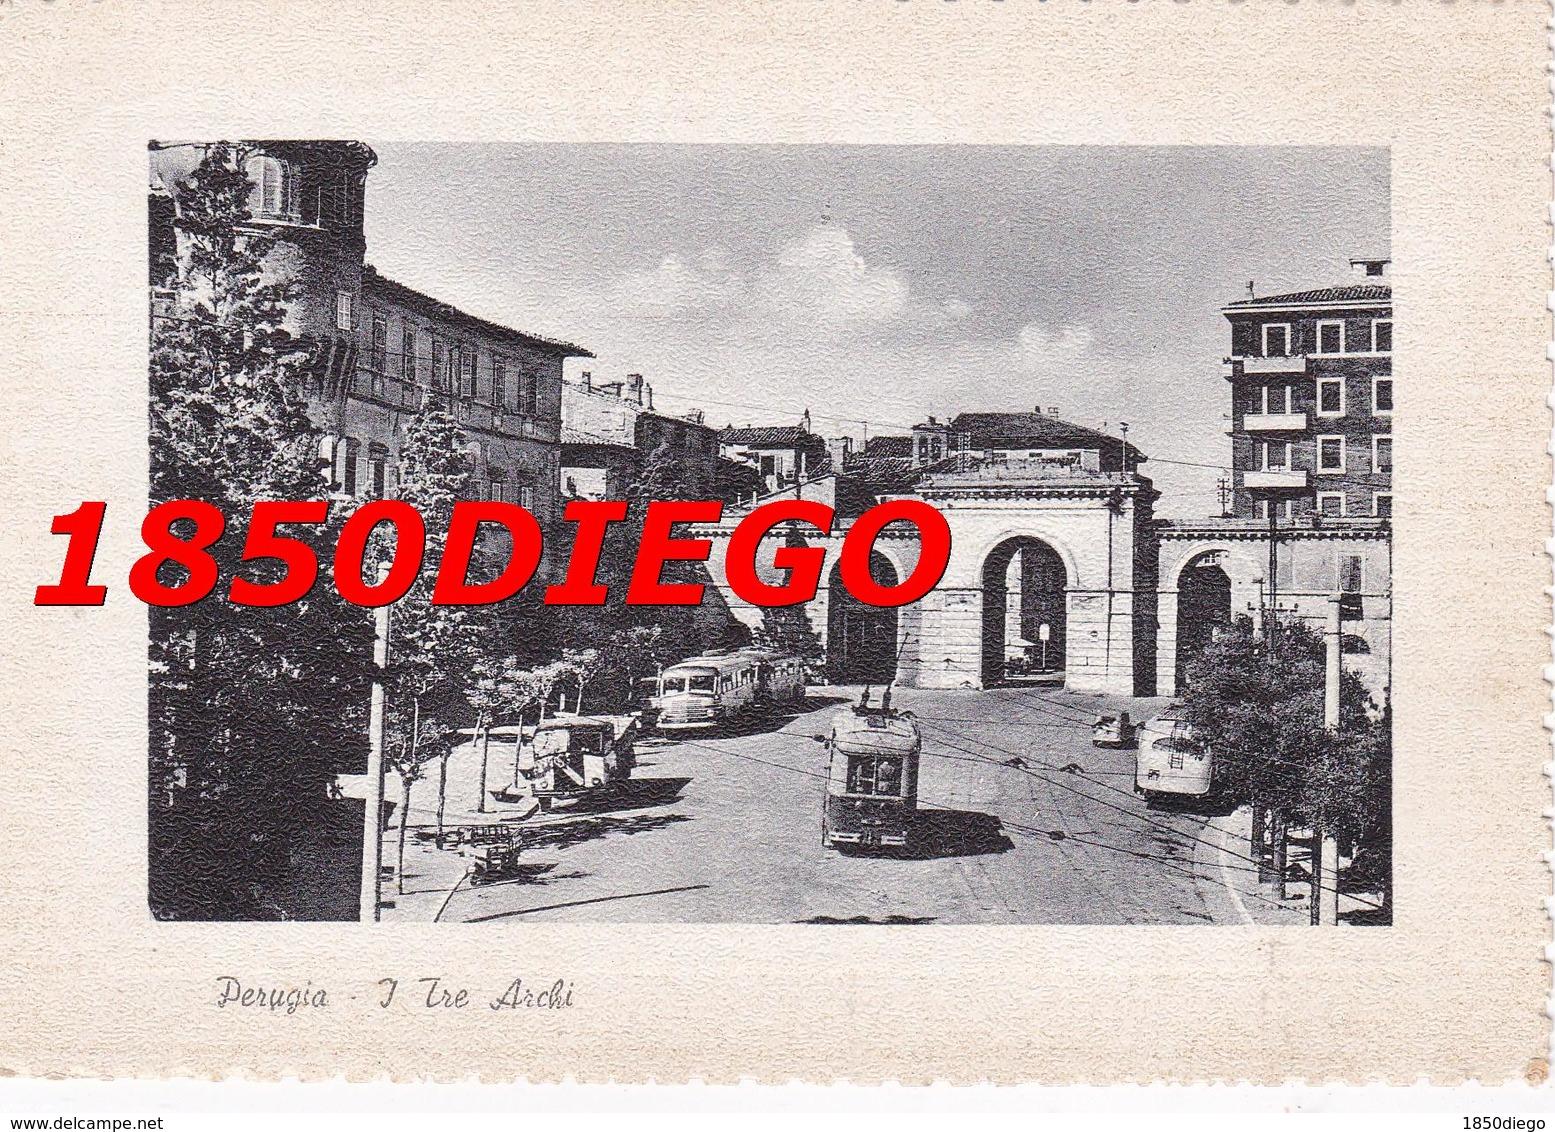 PERUGIA - I TRE ARCHI F/GRANDE VIAGGIATA 1957 ANIMATA - Perugia